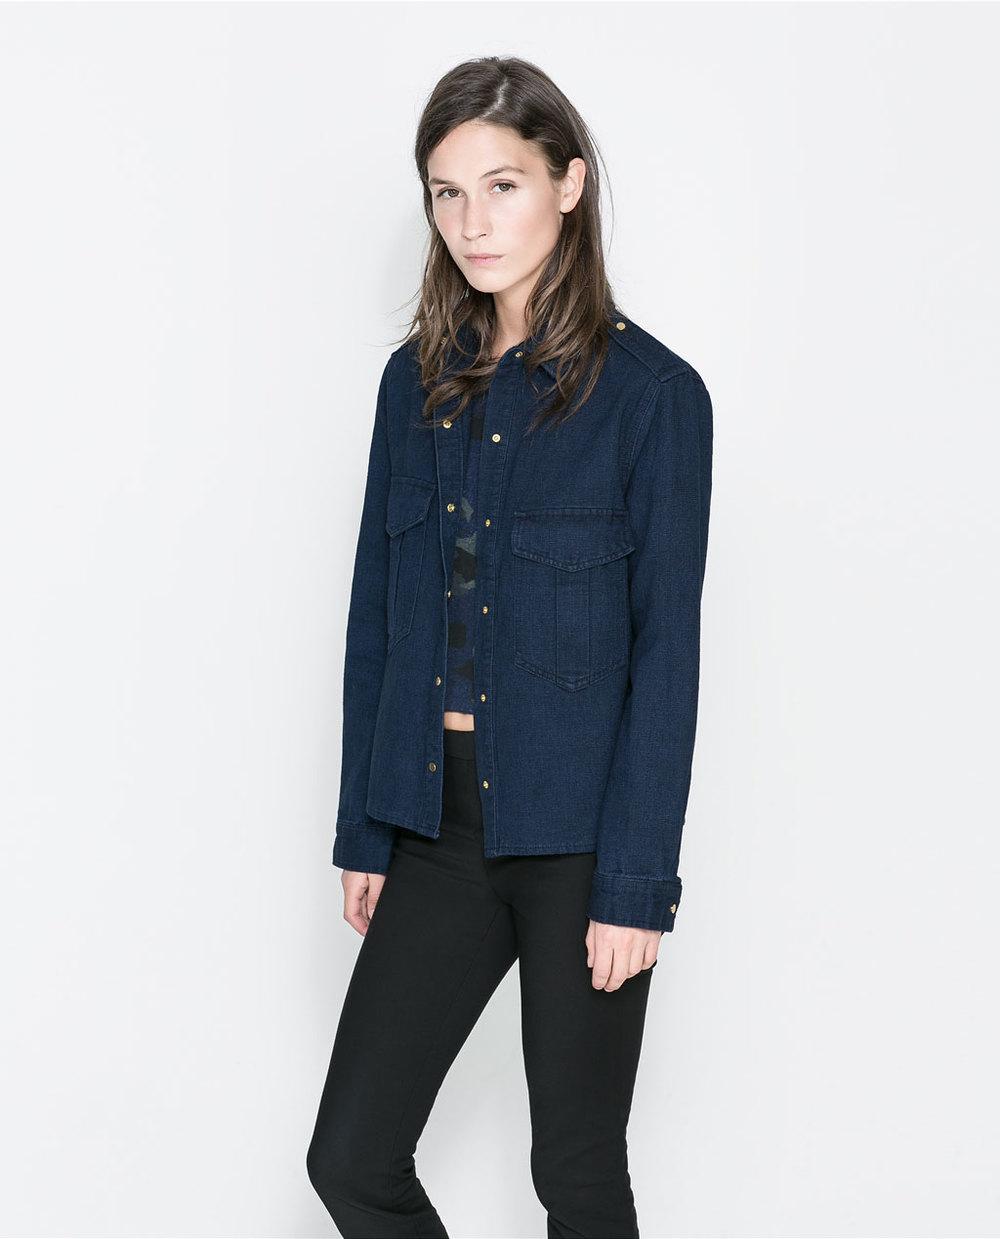 Zara Denim overshirt. Zara. Was: $79.90. Now: $29.99.